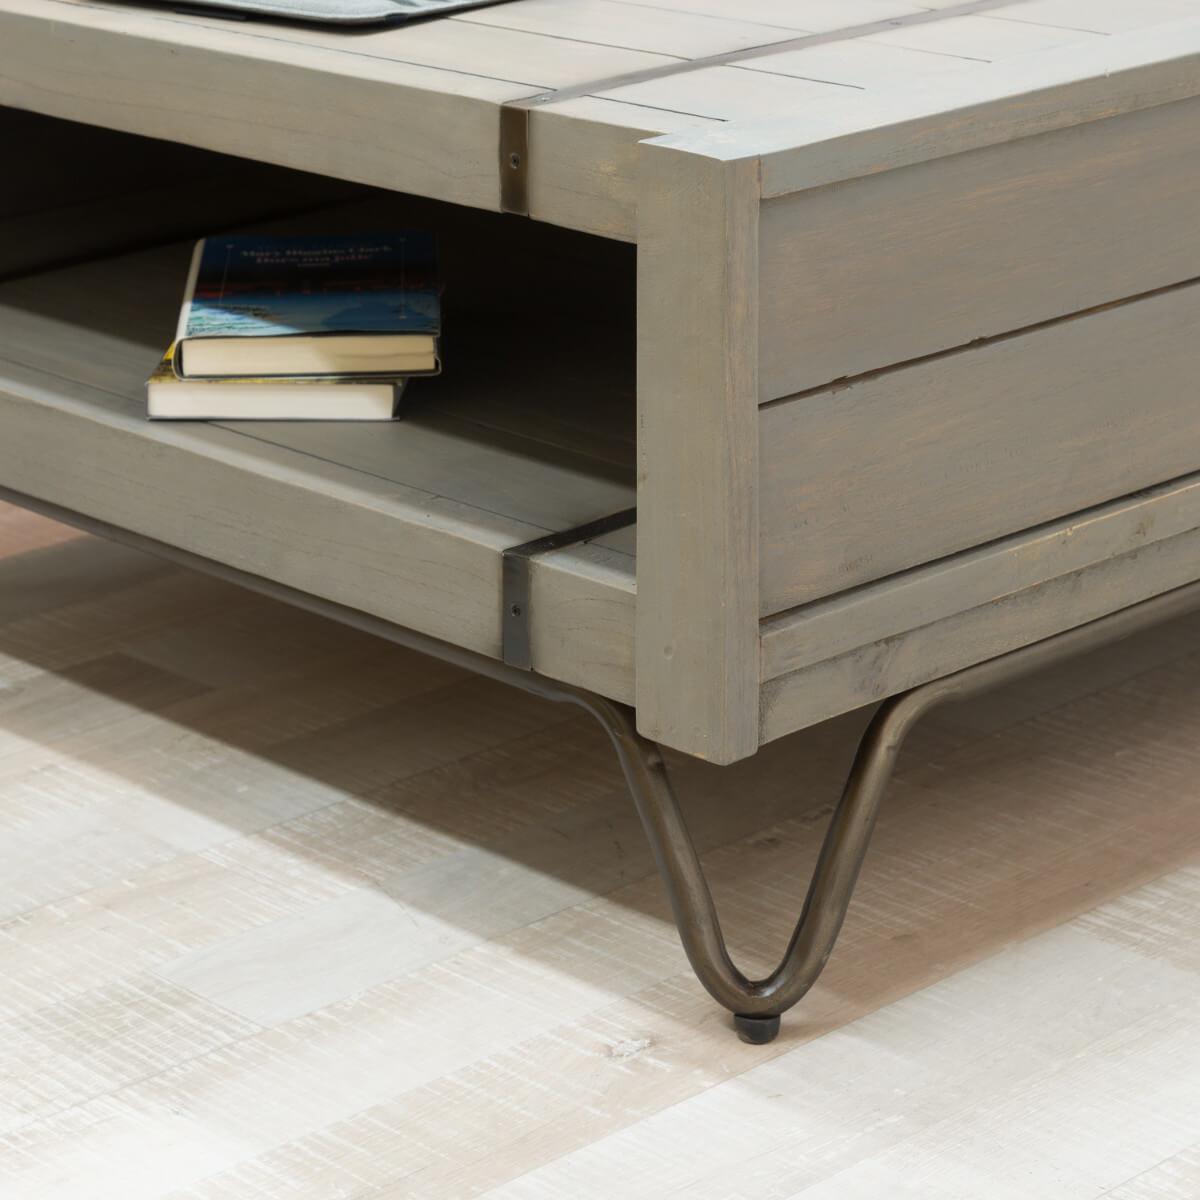 table basse industrielle meuble en bois rectangle grise mindi loft 1 m. Black Bedroom Furniture Sets. Home Design Ideas